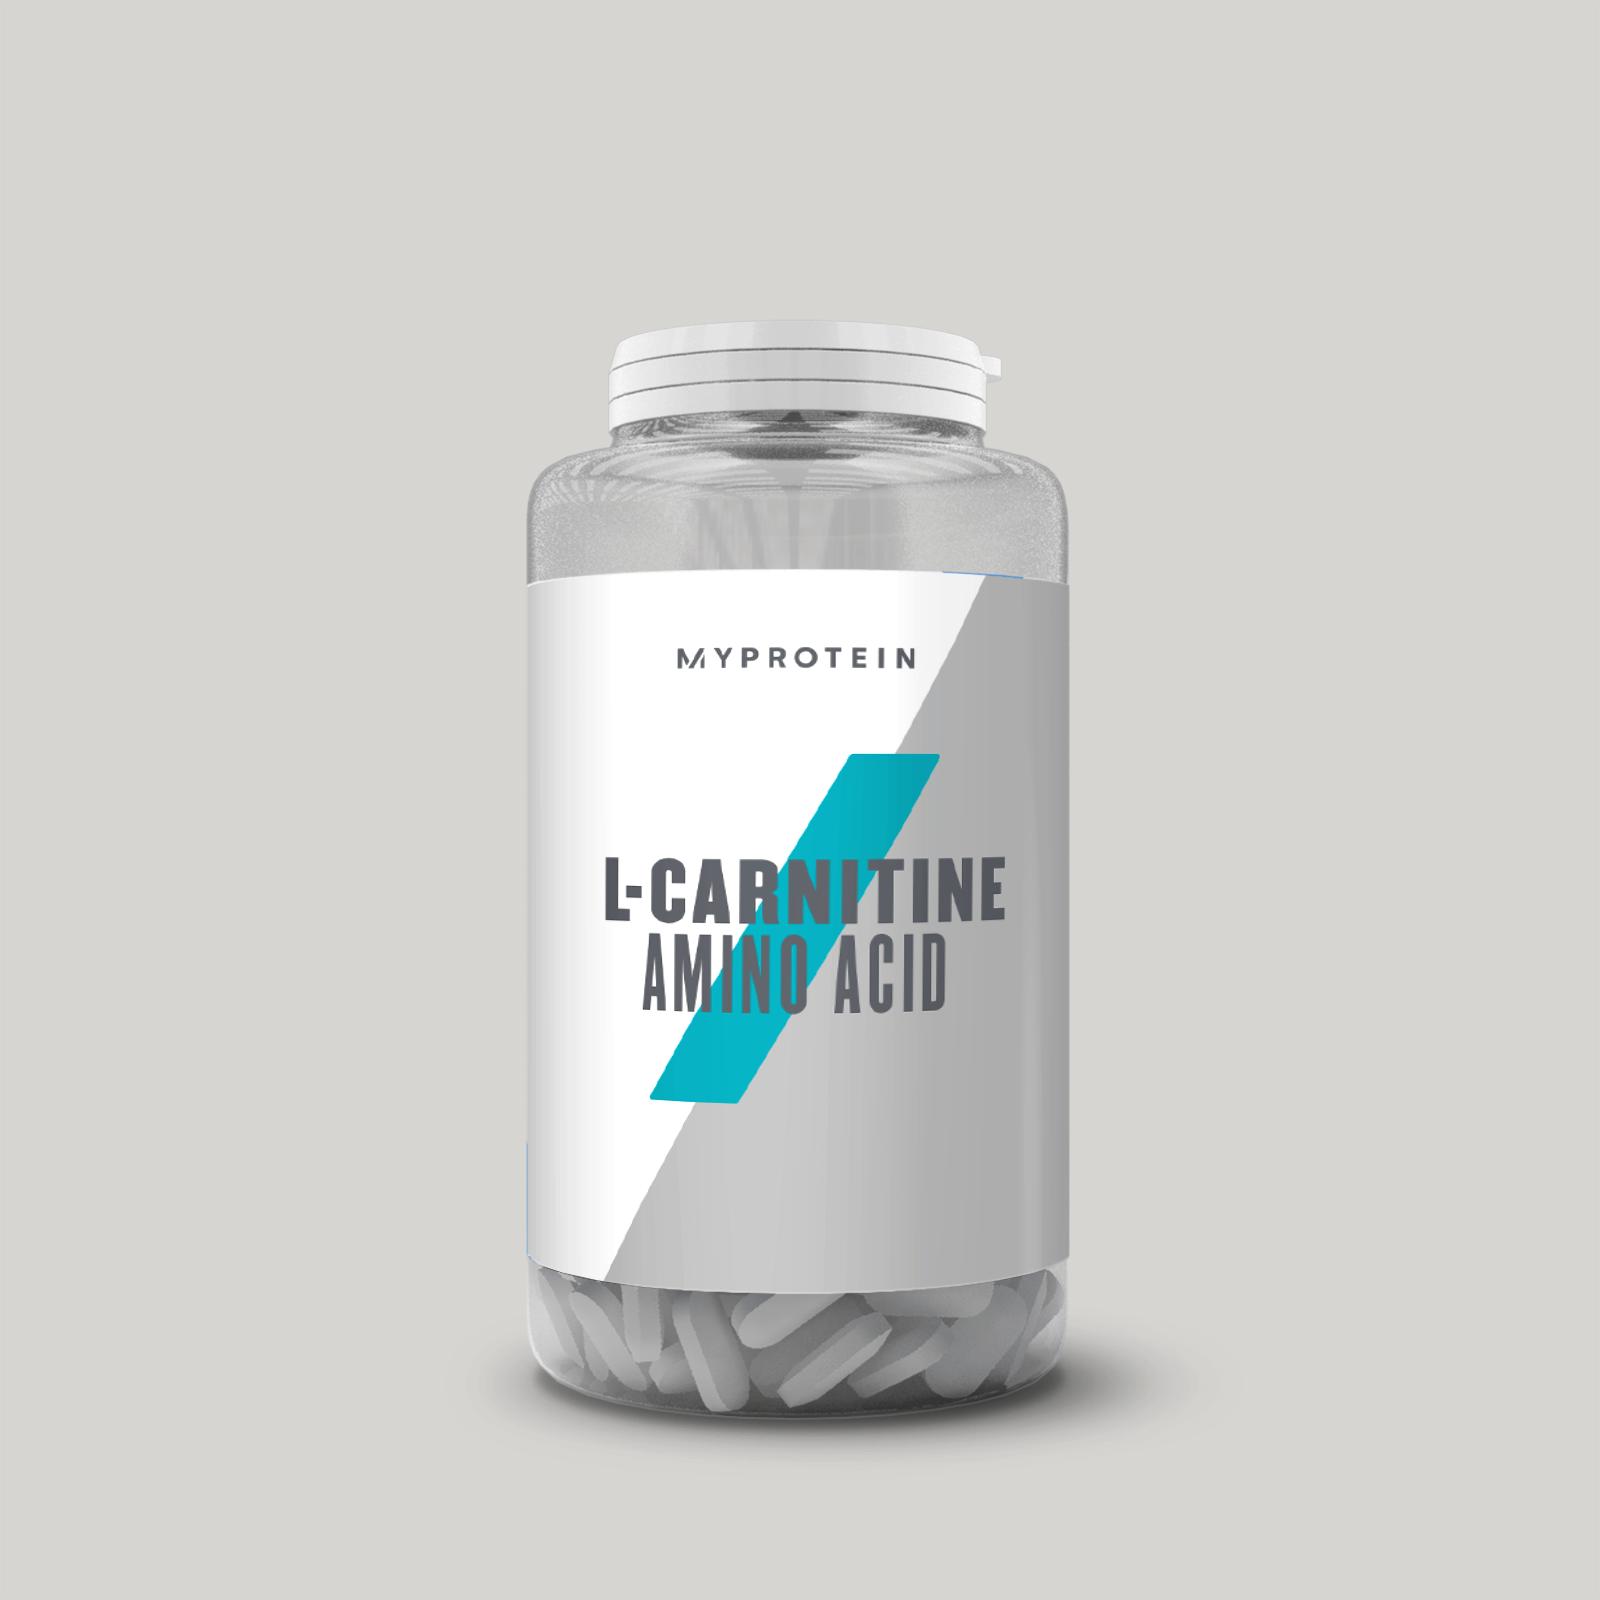 ... L-Carnitine Amino Acid - 90tablets - Unflavoured f11209b5fab4